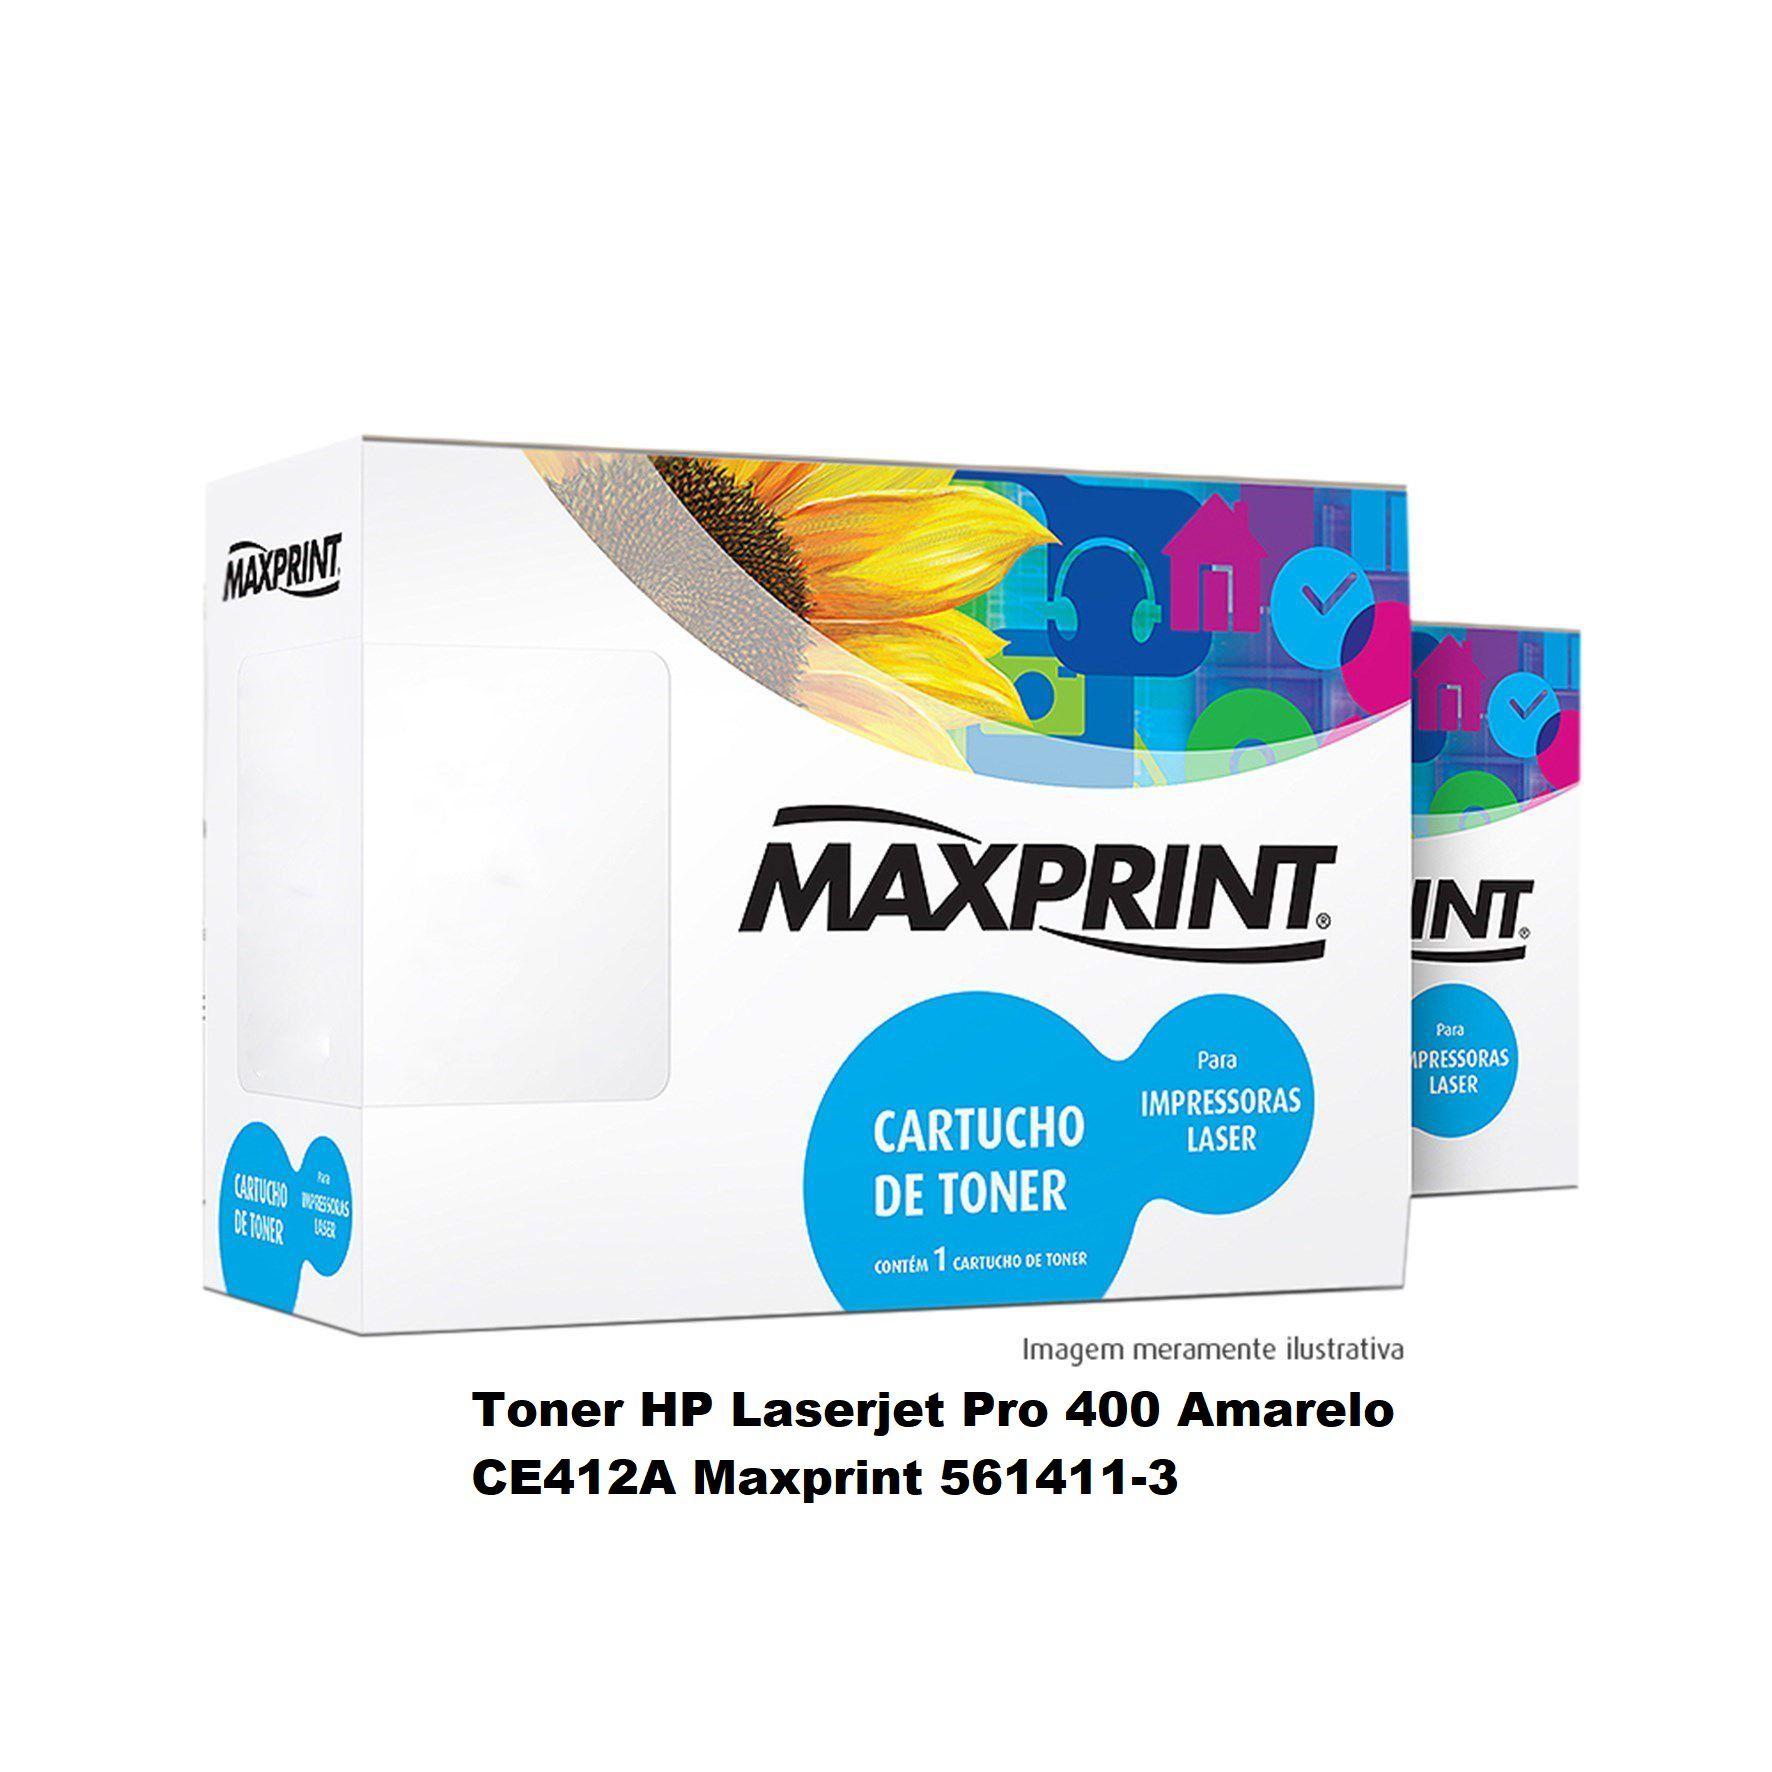 Toner HP Laserjet Pro 400 Amarelo CE412A Maxprint 561411-3